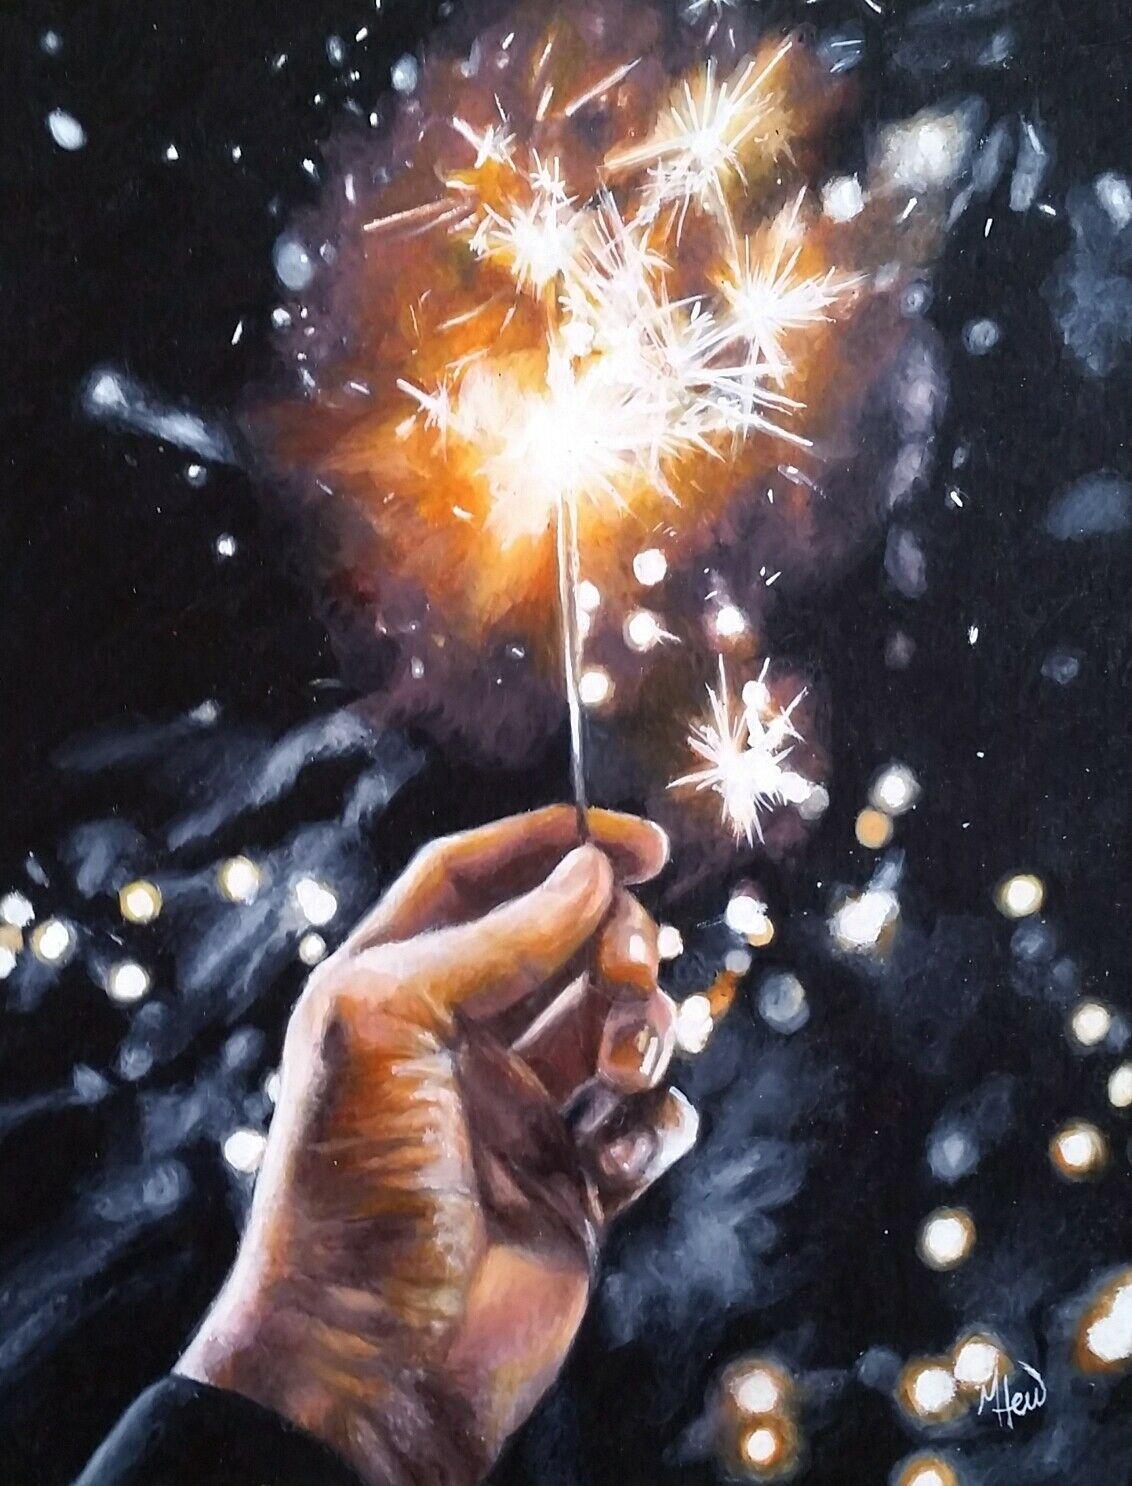 And flying sparks fireworks